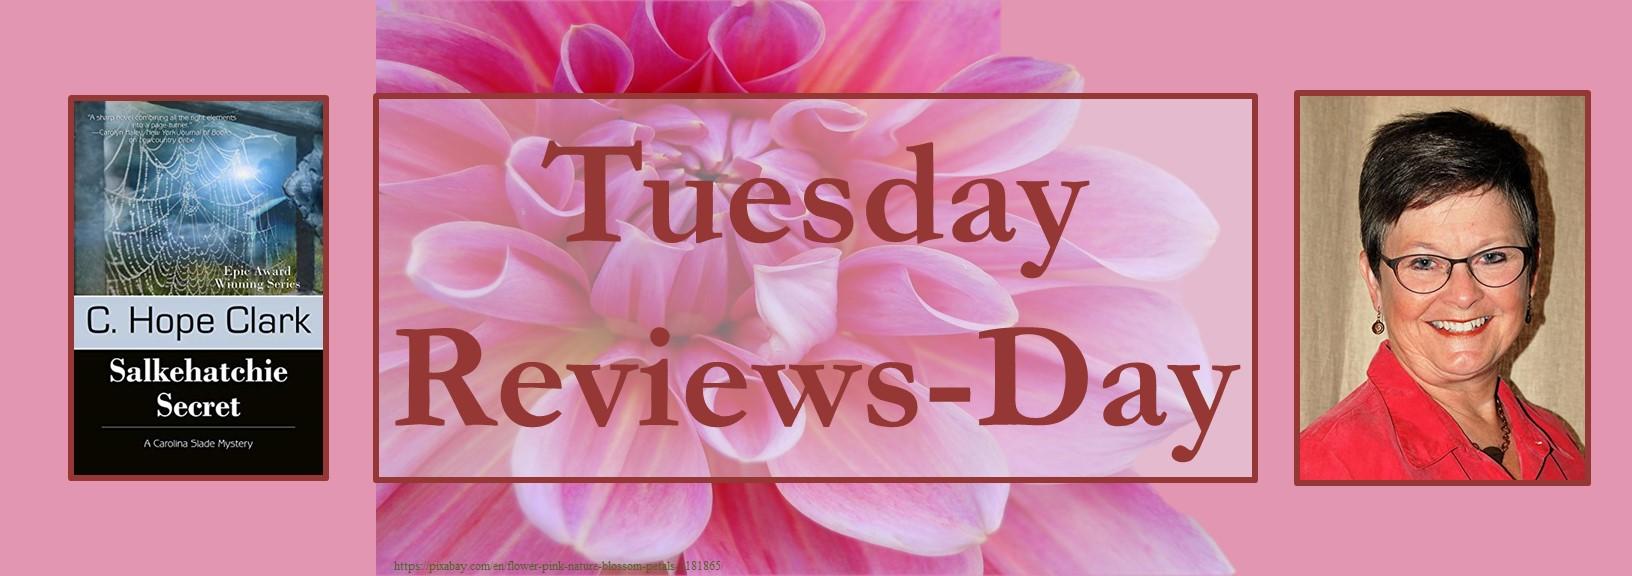 031621 - salkehatchie secret - tuesday reviews day banner